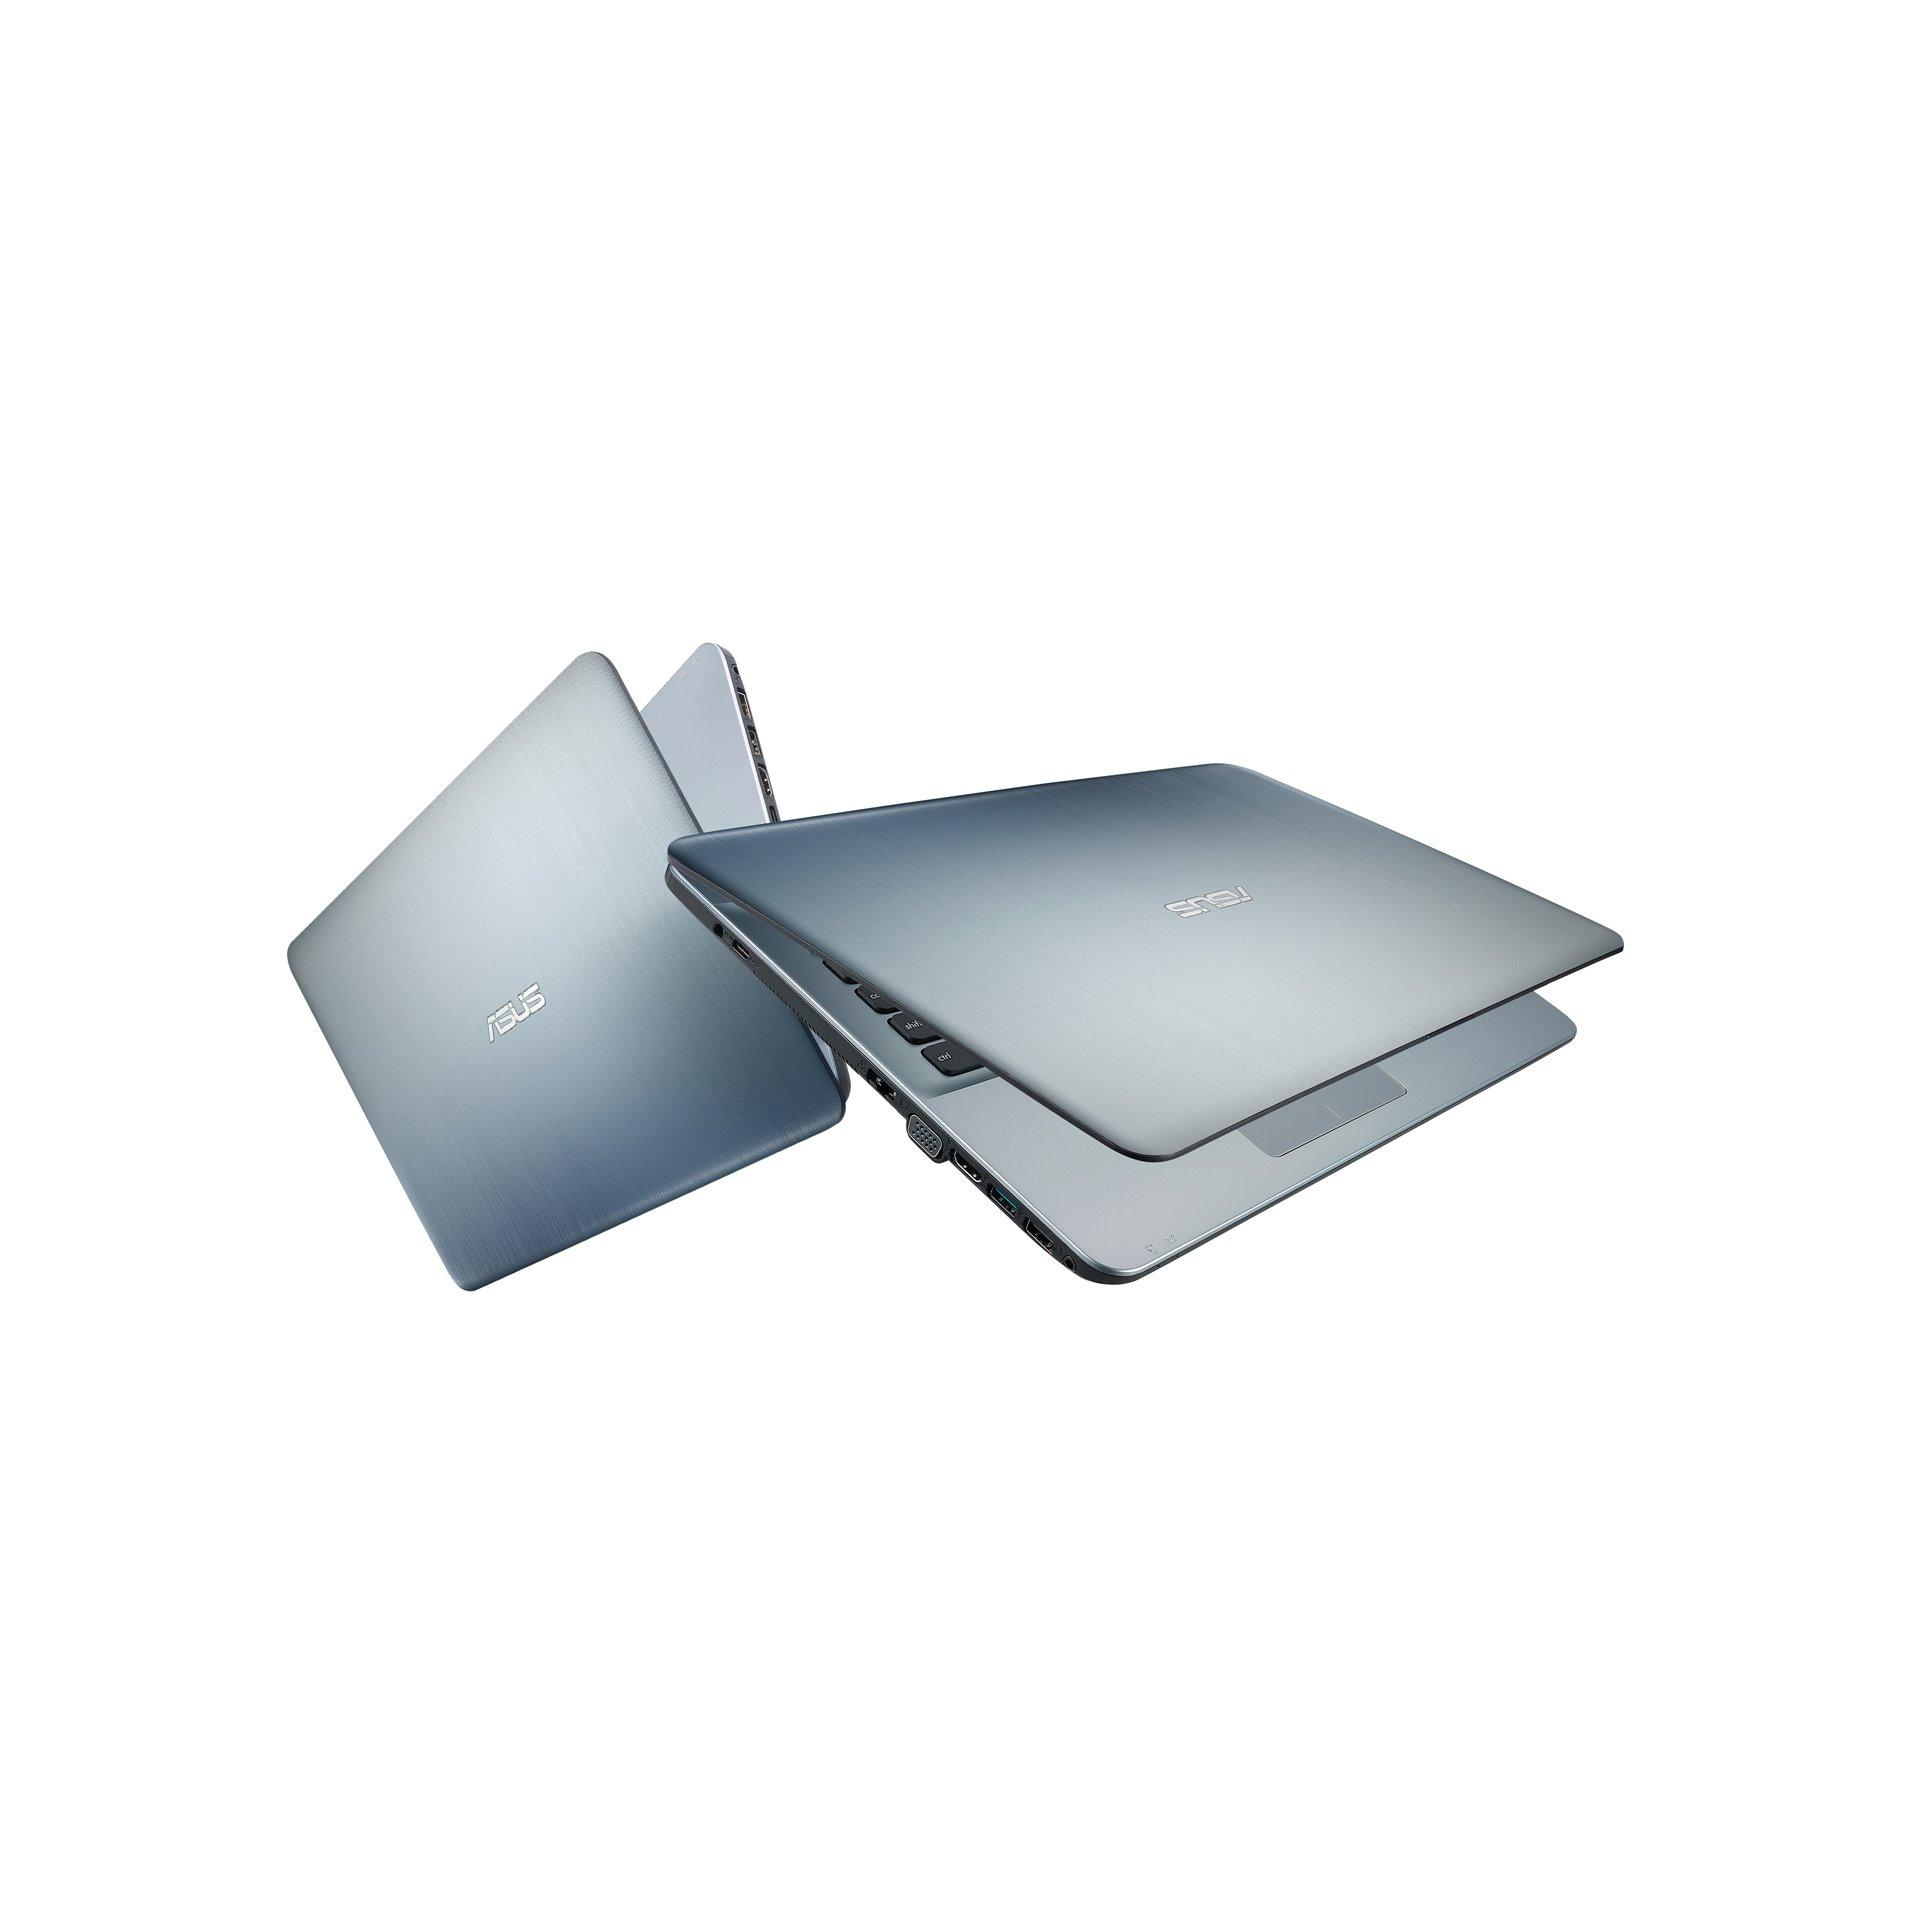 Wx093t Asus Rog Gl 552 X Dm409t Core I7 7700 4096mb 1tb N Vidia Gtx950 Laptop X441uv Wx091t Wx092t Wx094t Wx095t I3 6006u 4gb 500gb Win 10 Ori